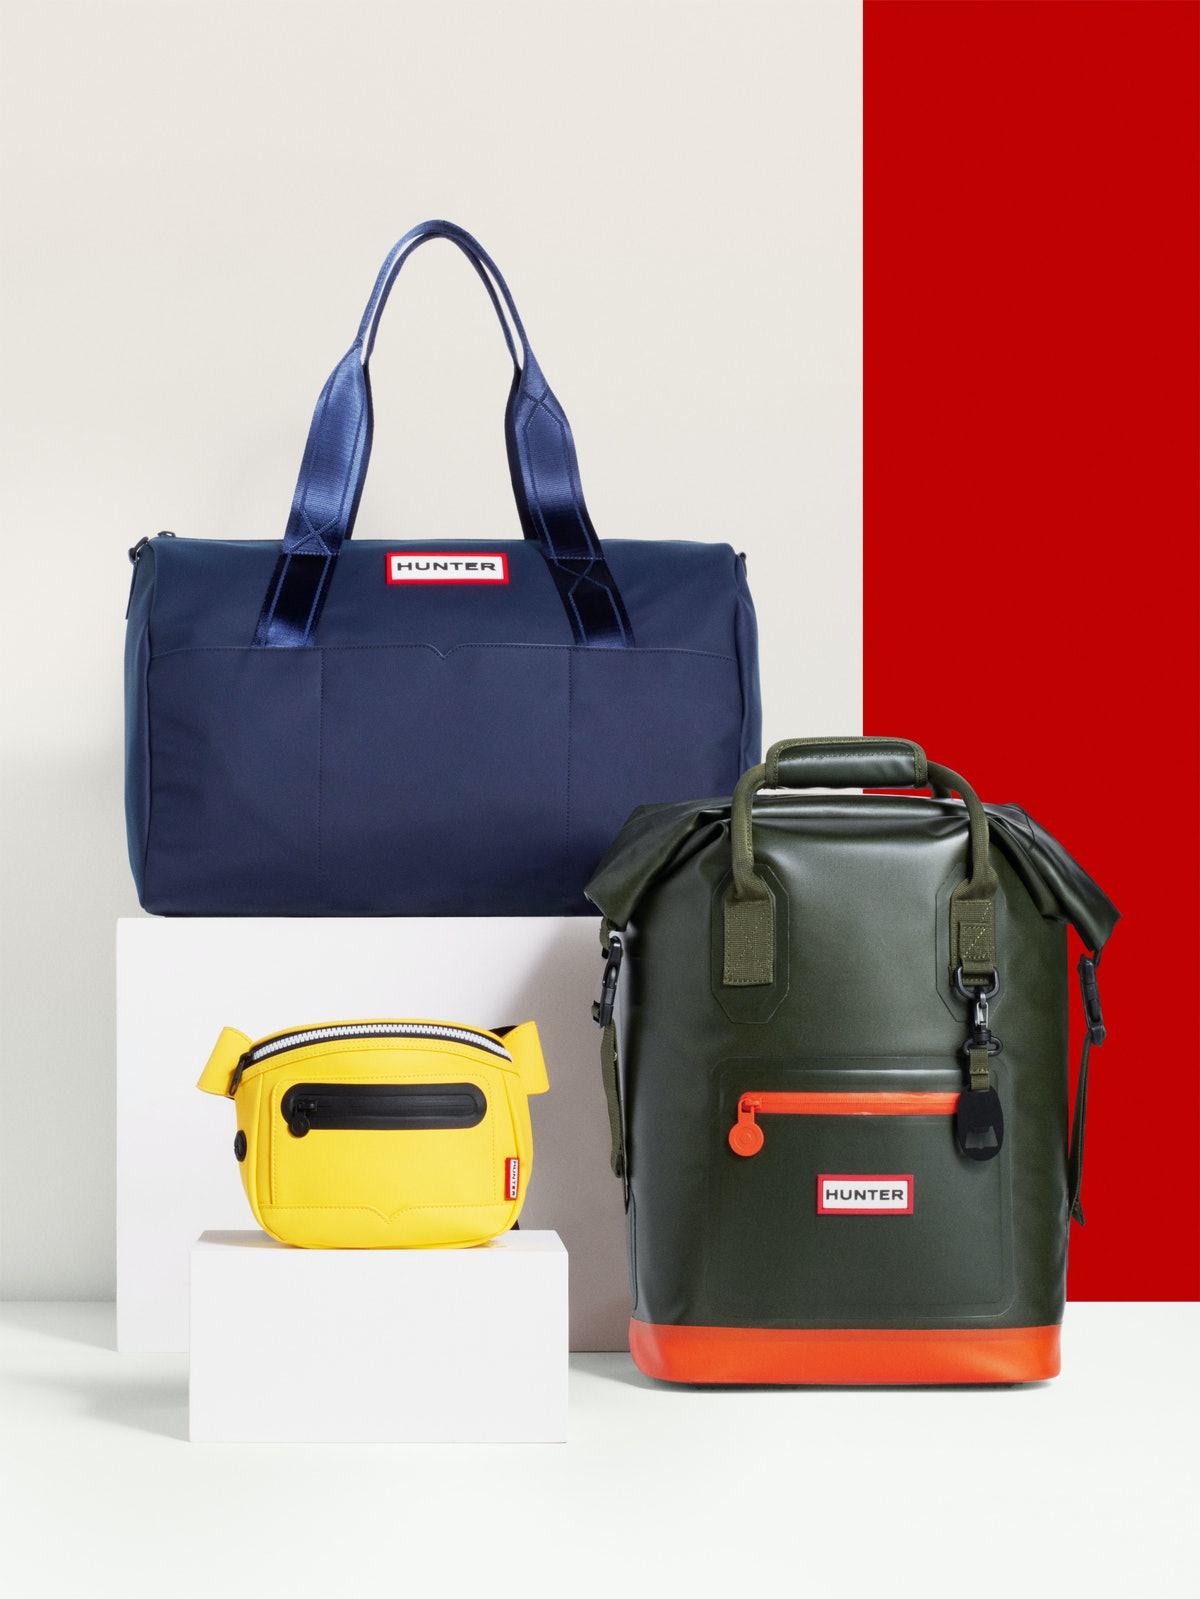 Hunter for Target Bags